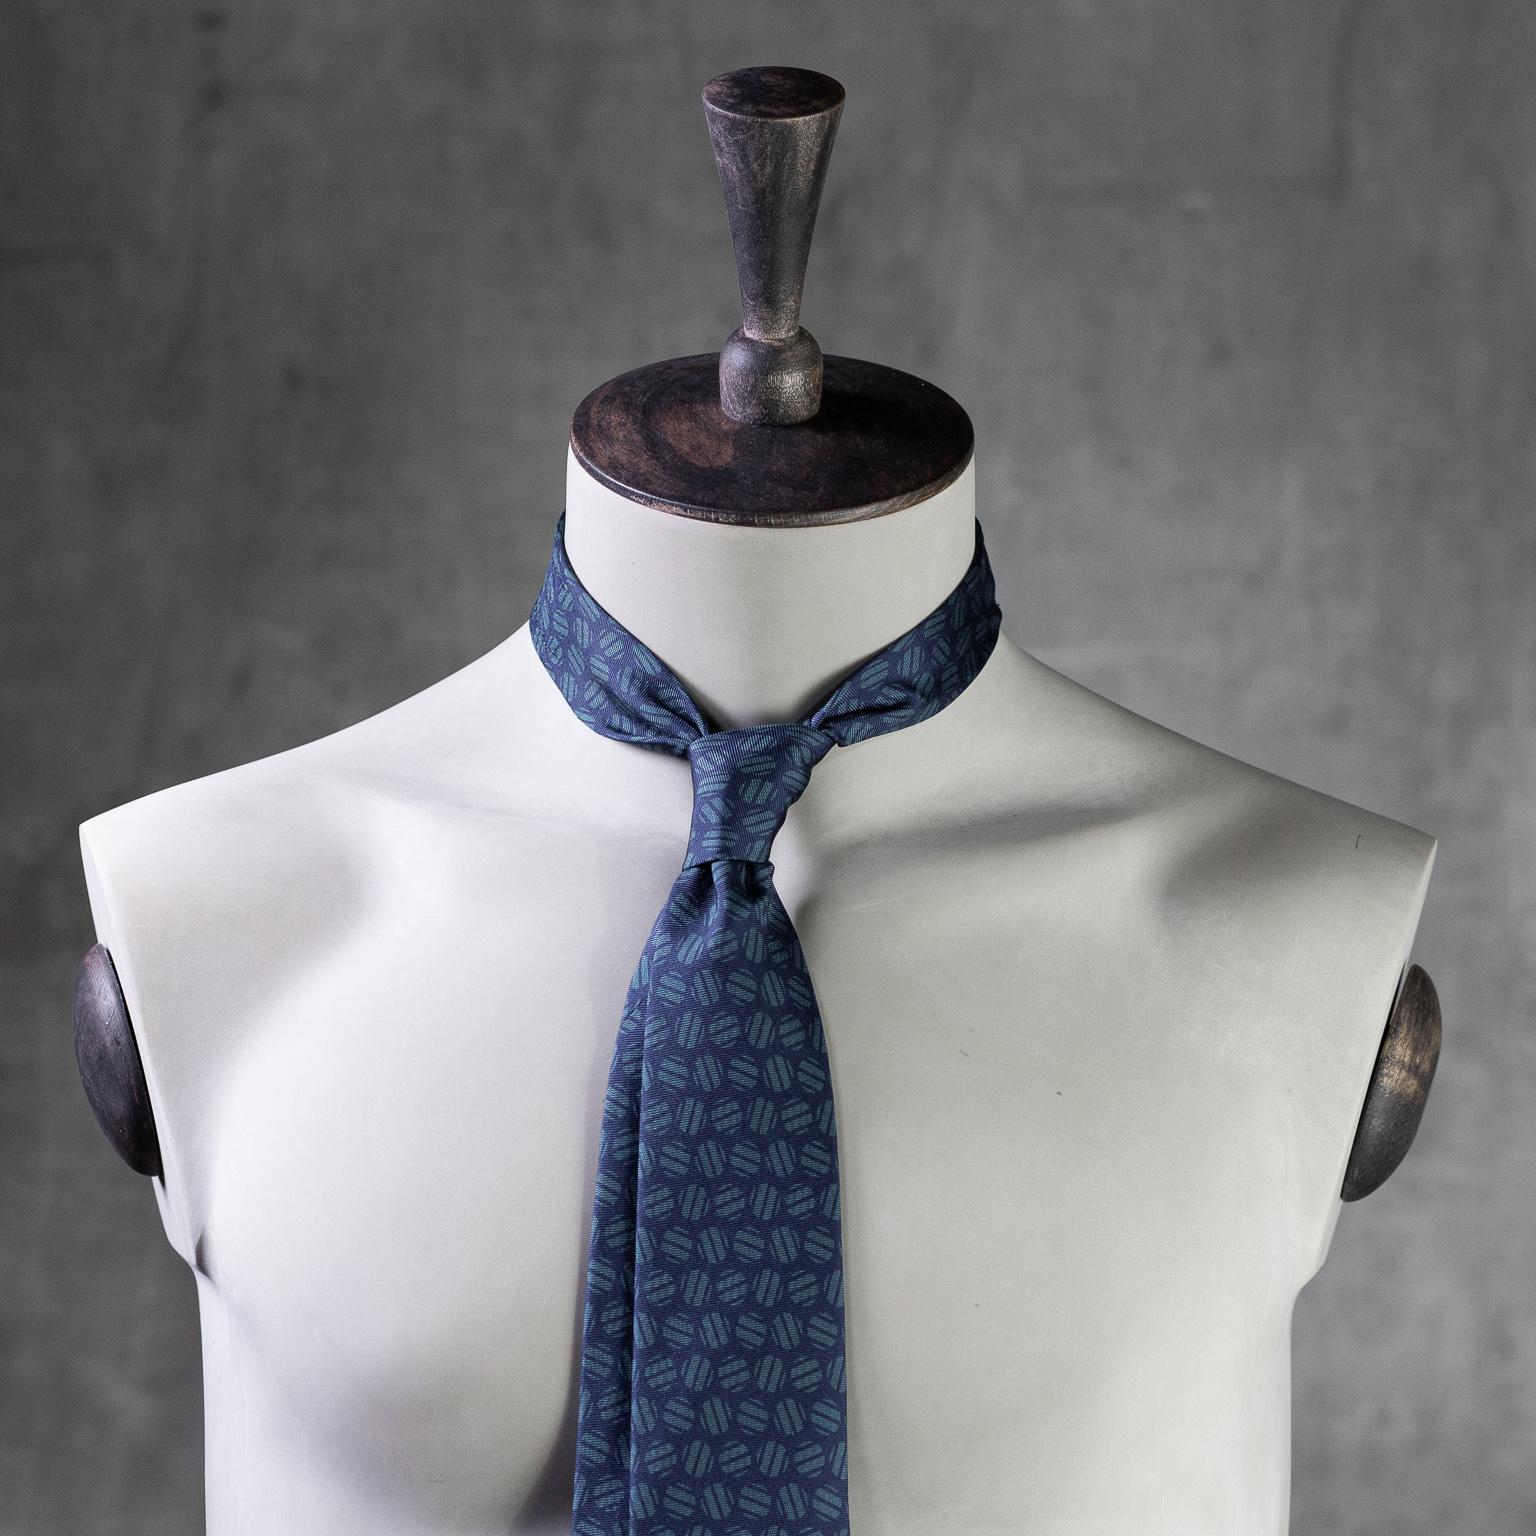 PRINTED-SILK-SEDA-ESTAMPADA-0583-Tie-Initials-Corbata-Iniciales-The-Seëlk-2